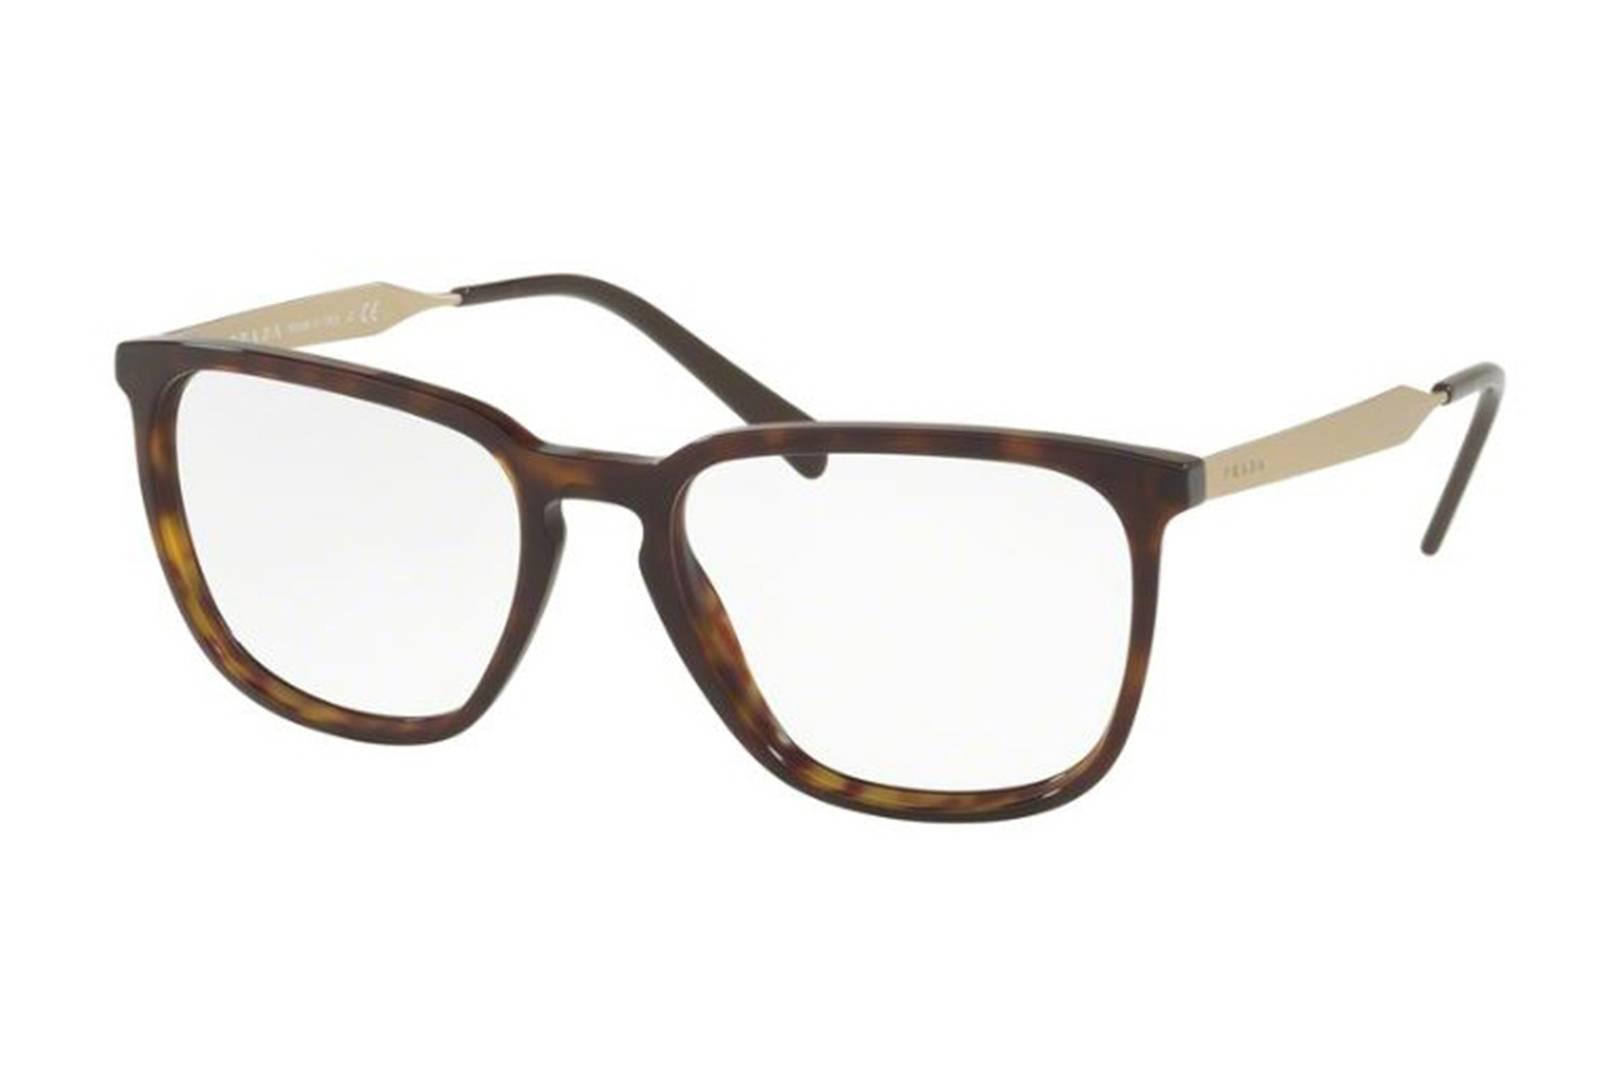 Best men\'s eyeglasses 2018 | British GQ